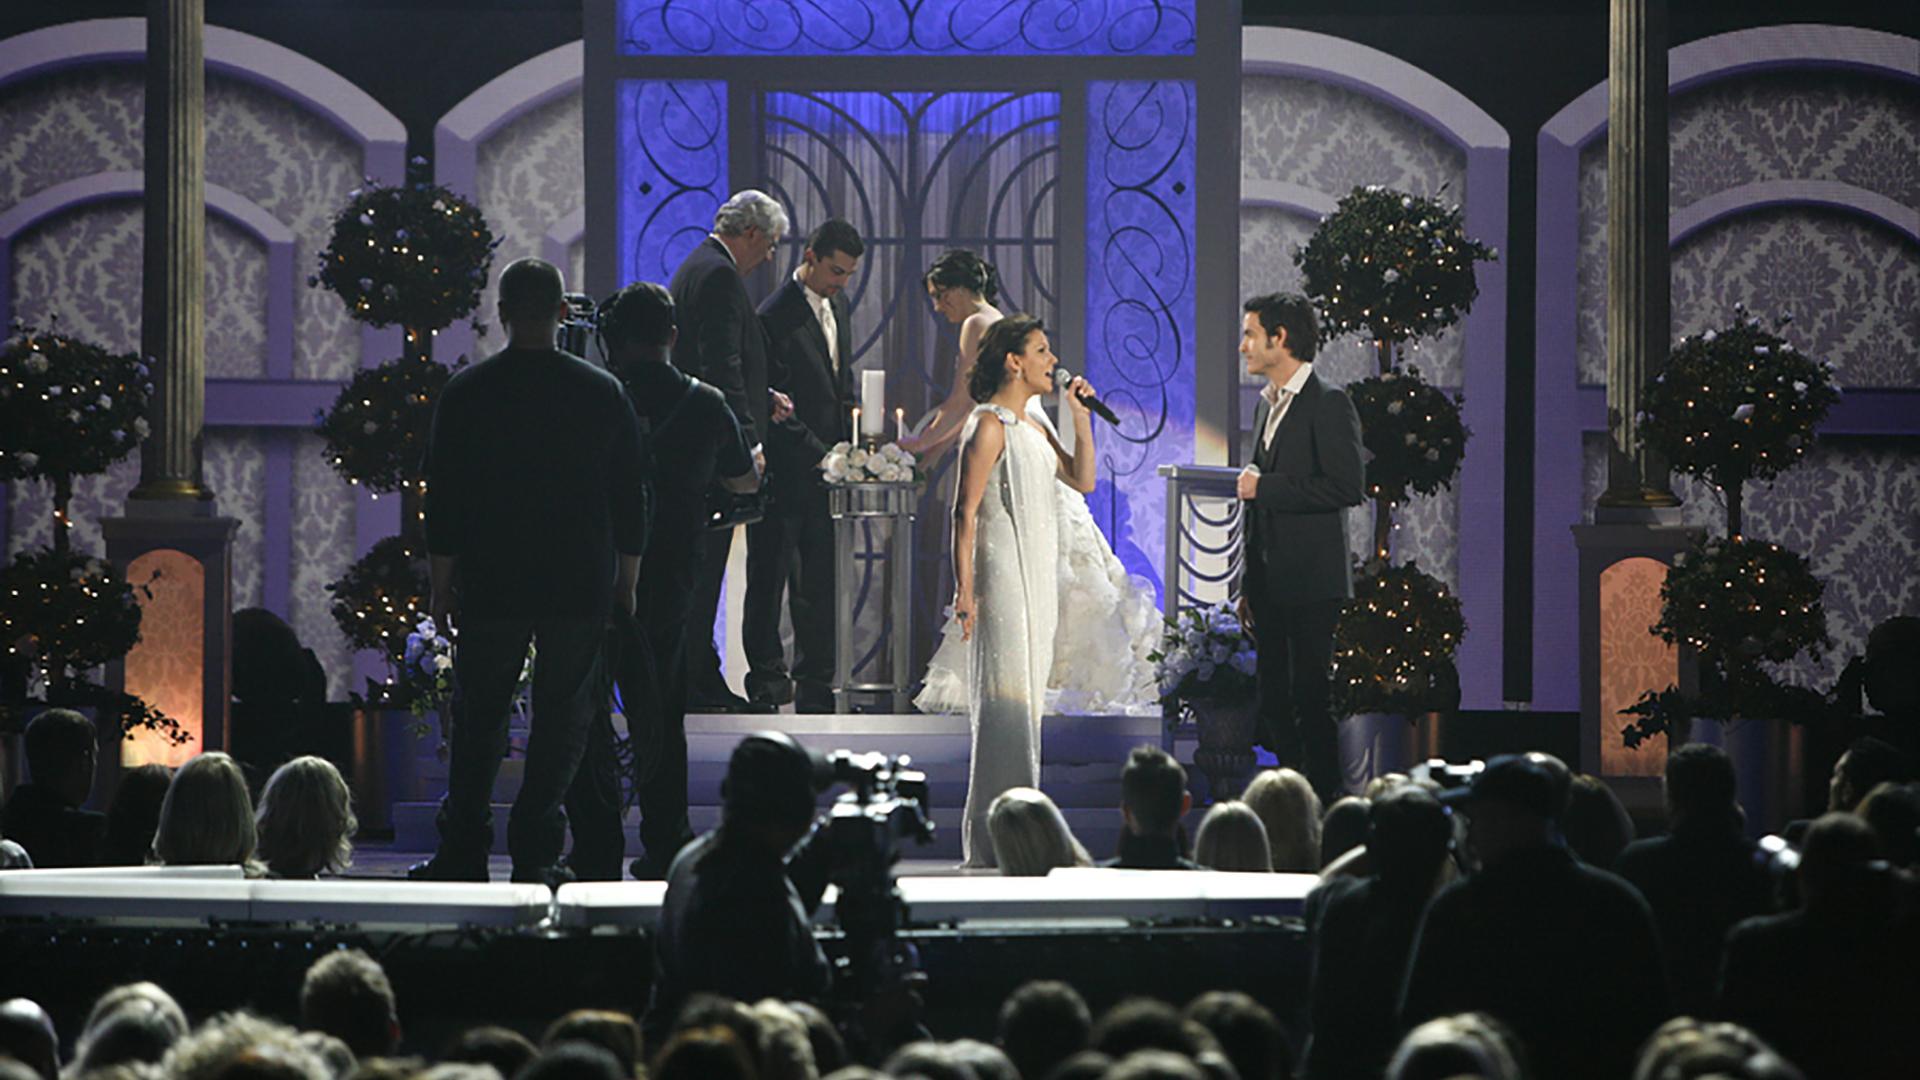 17. Martina McBride and Train singer Pat Monahan perform